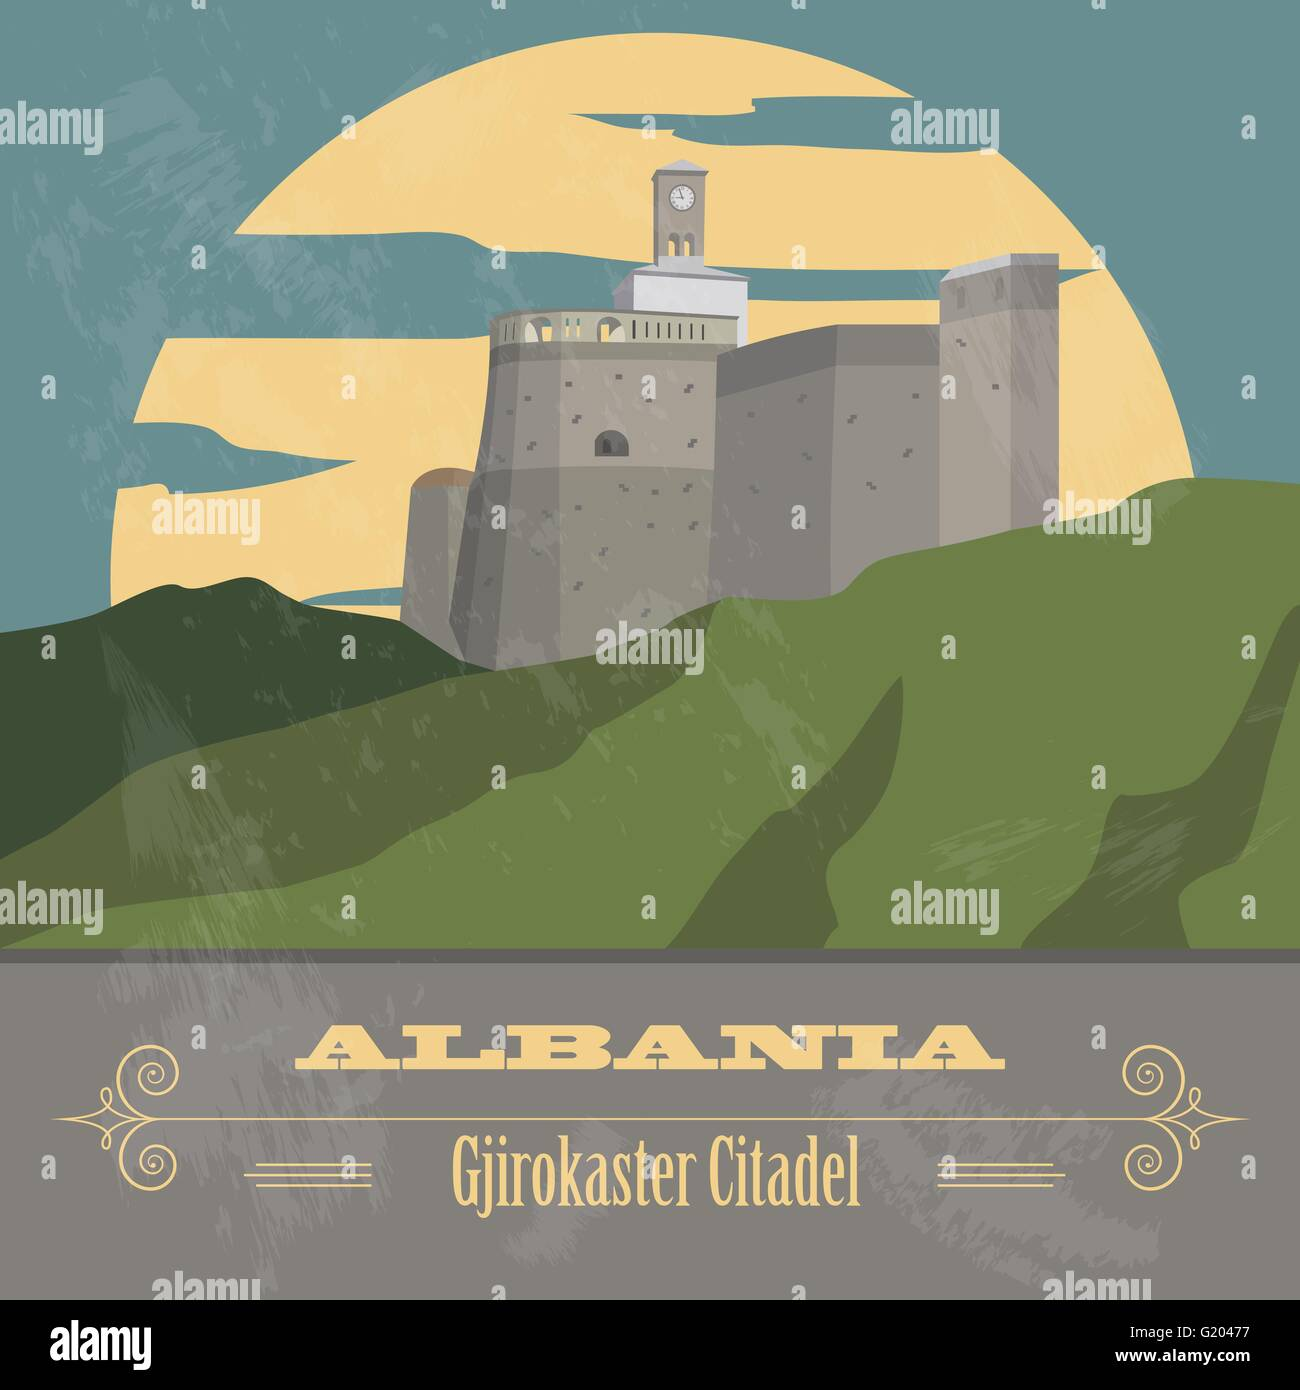 Albania landmarks. Retro styled image. Vector illustration - Stock Vector